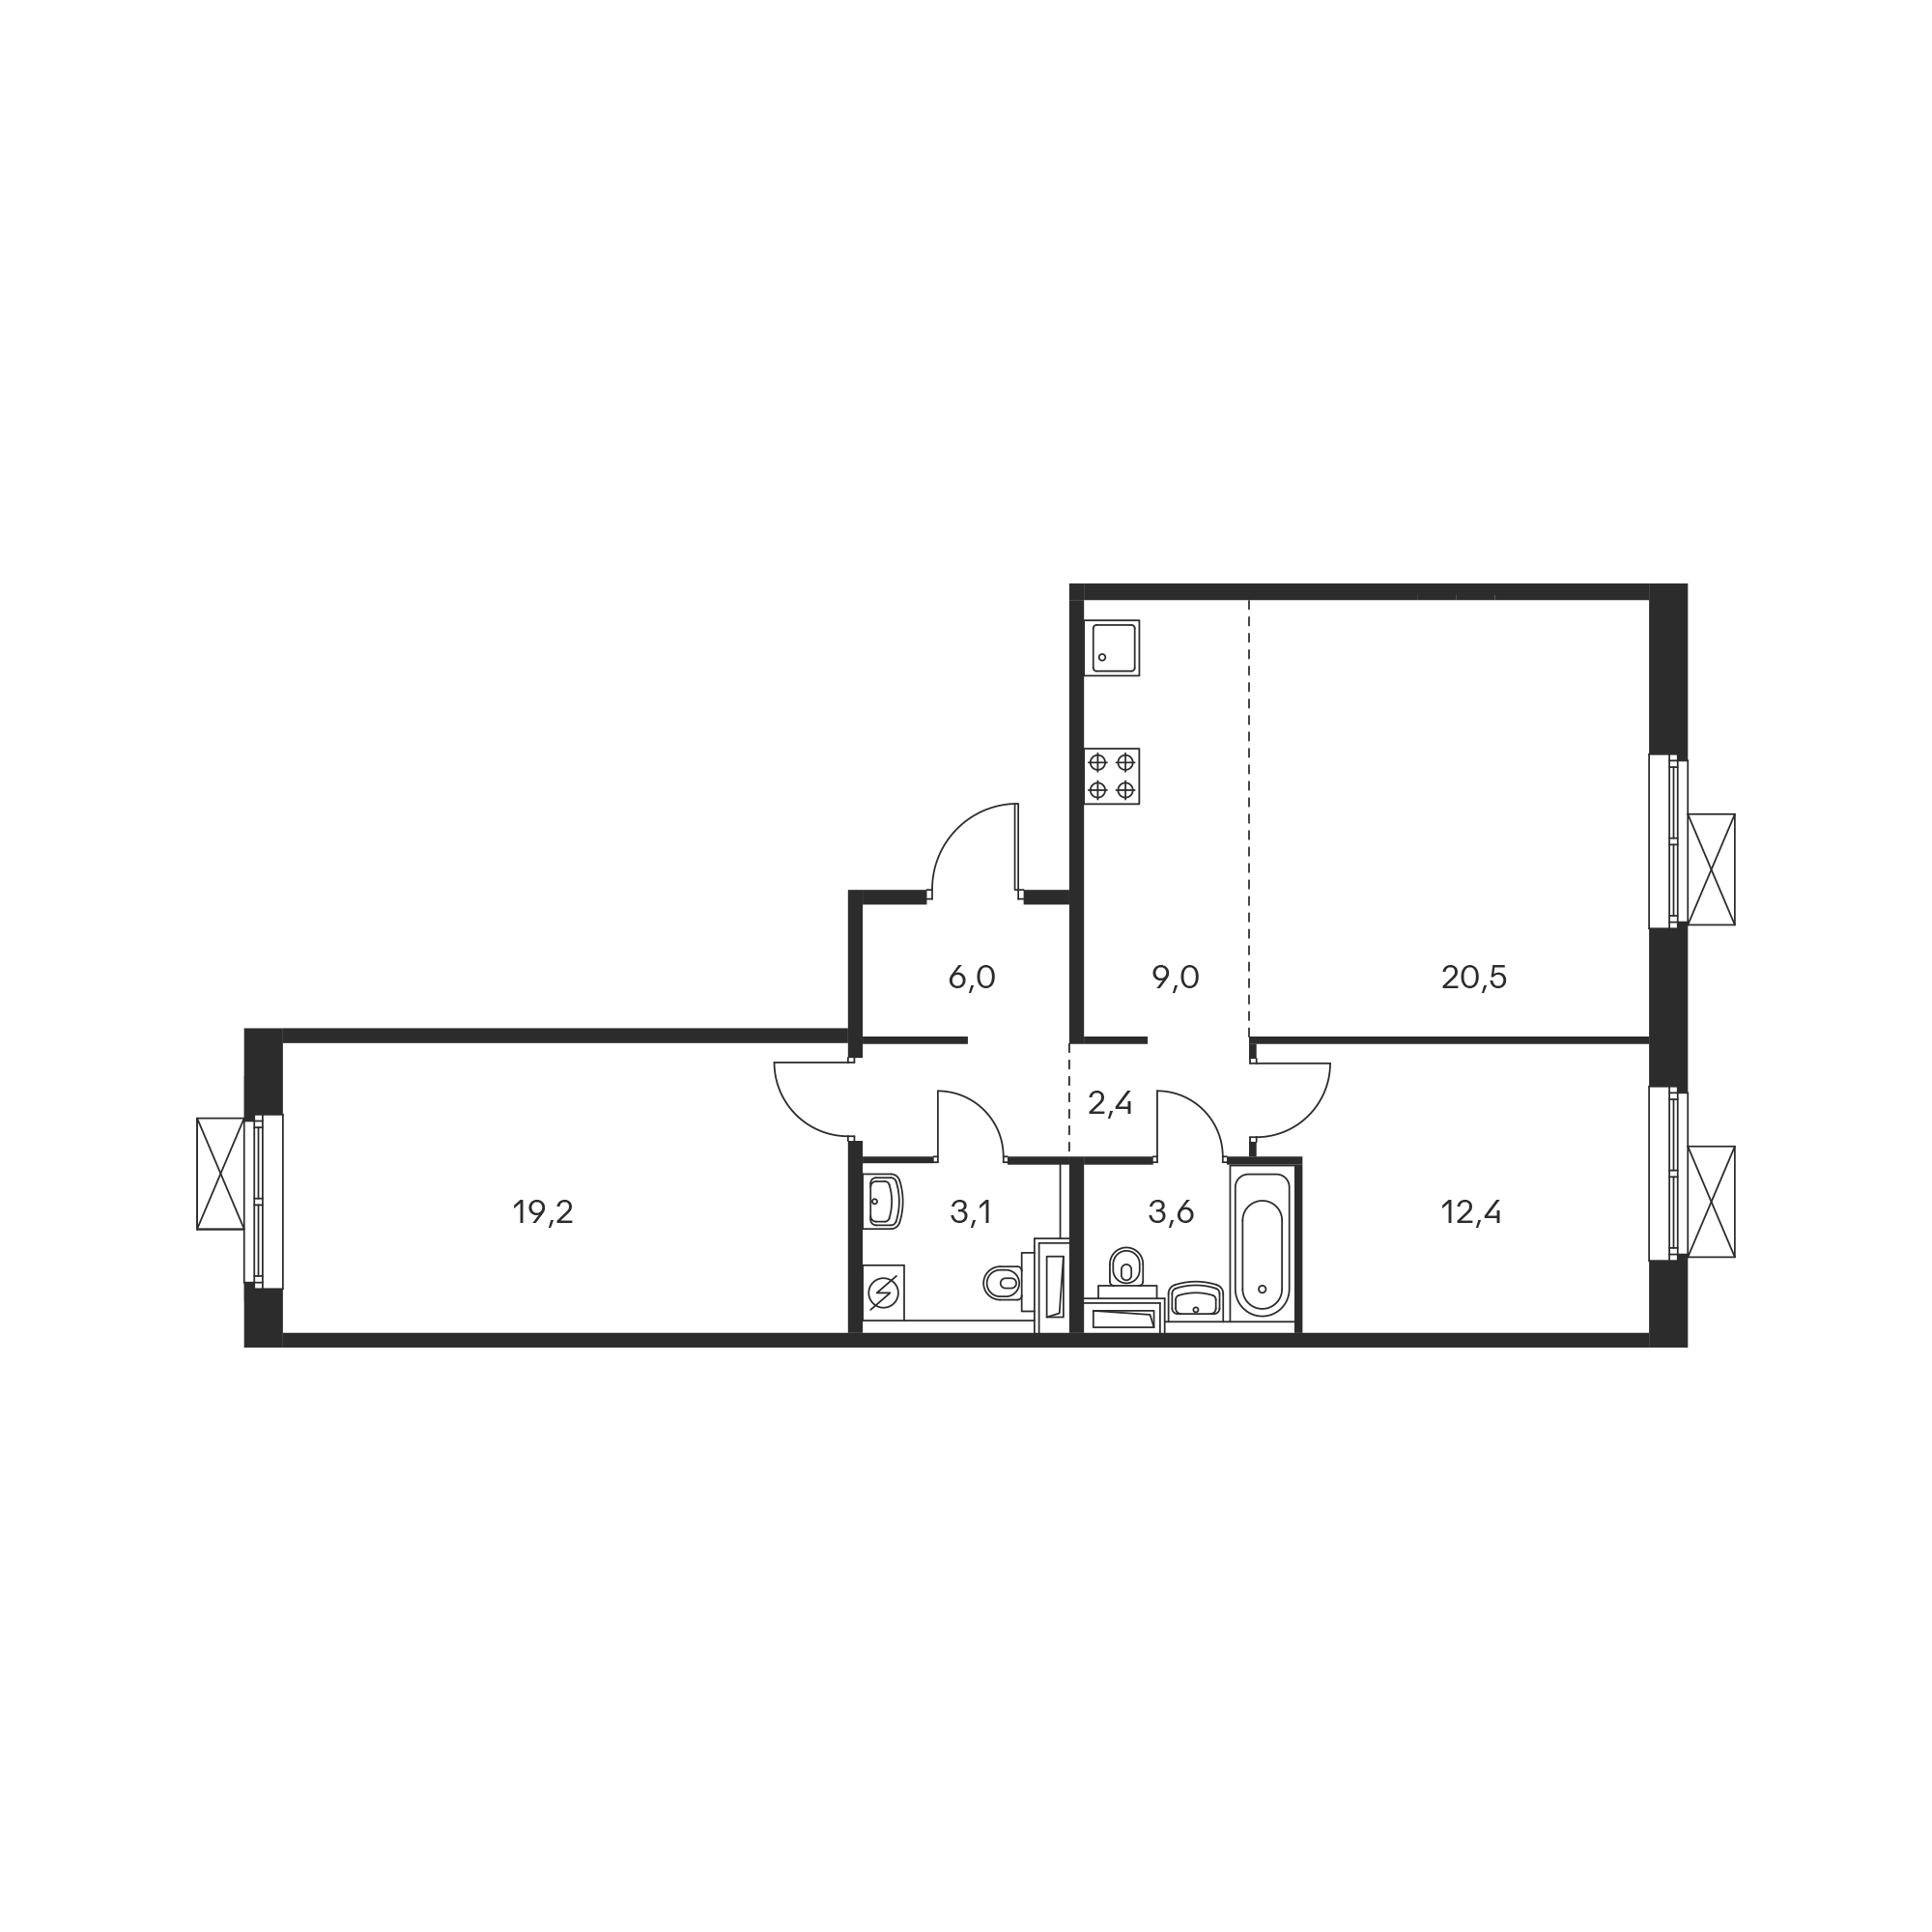 3NM12_8.1-2